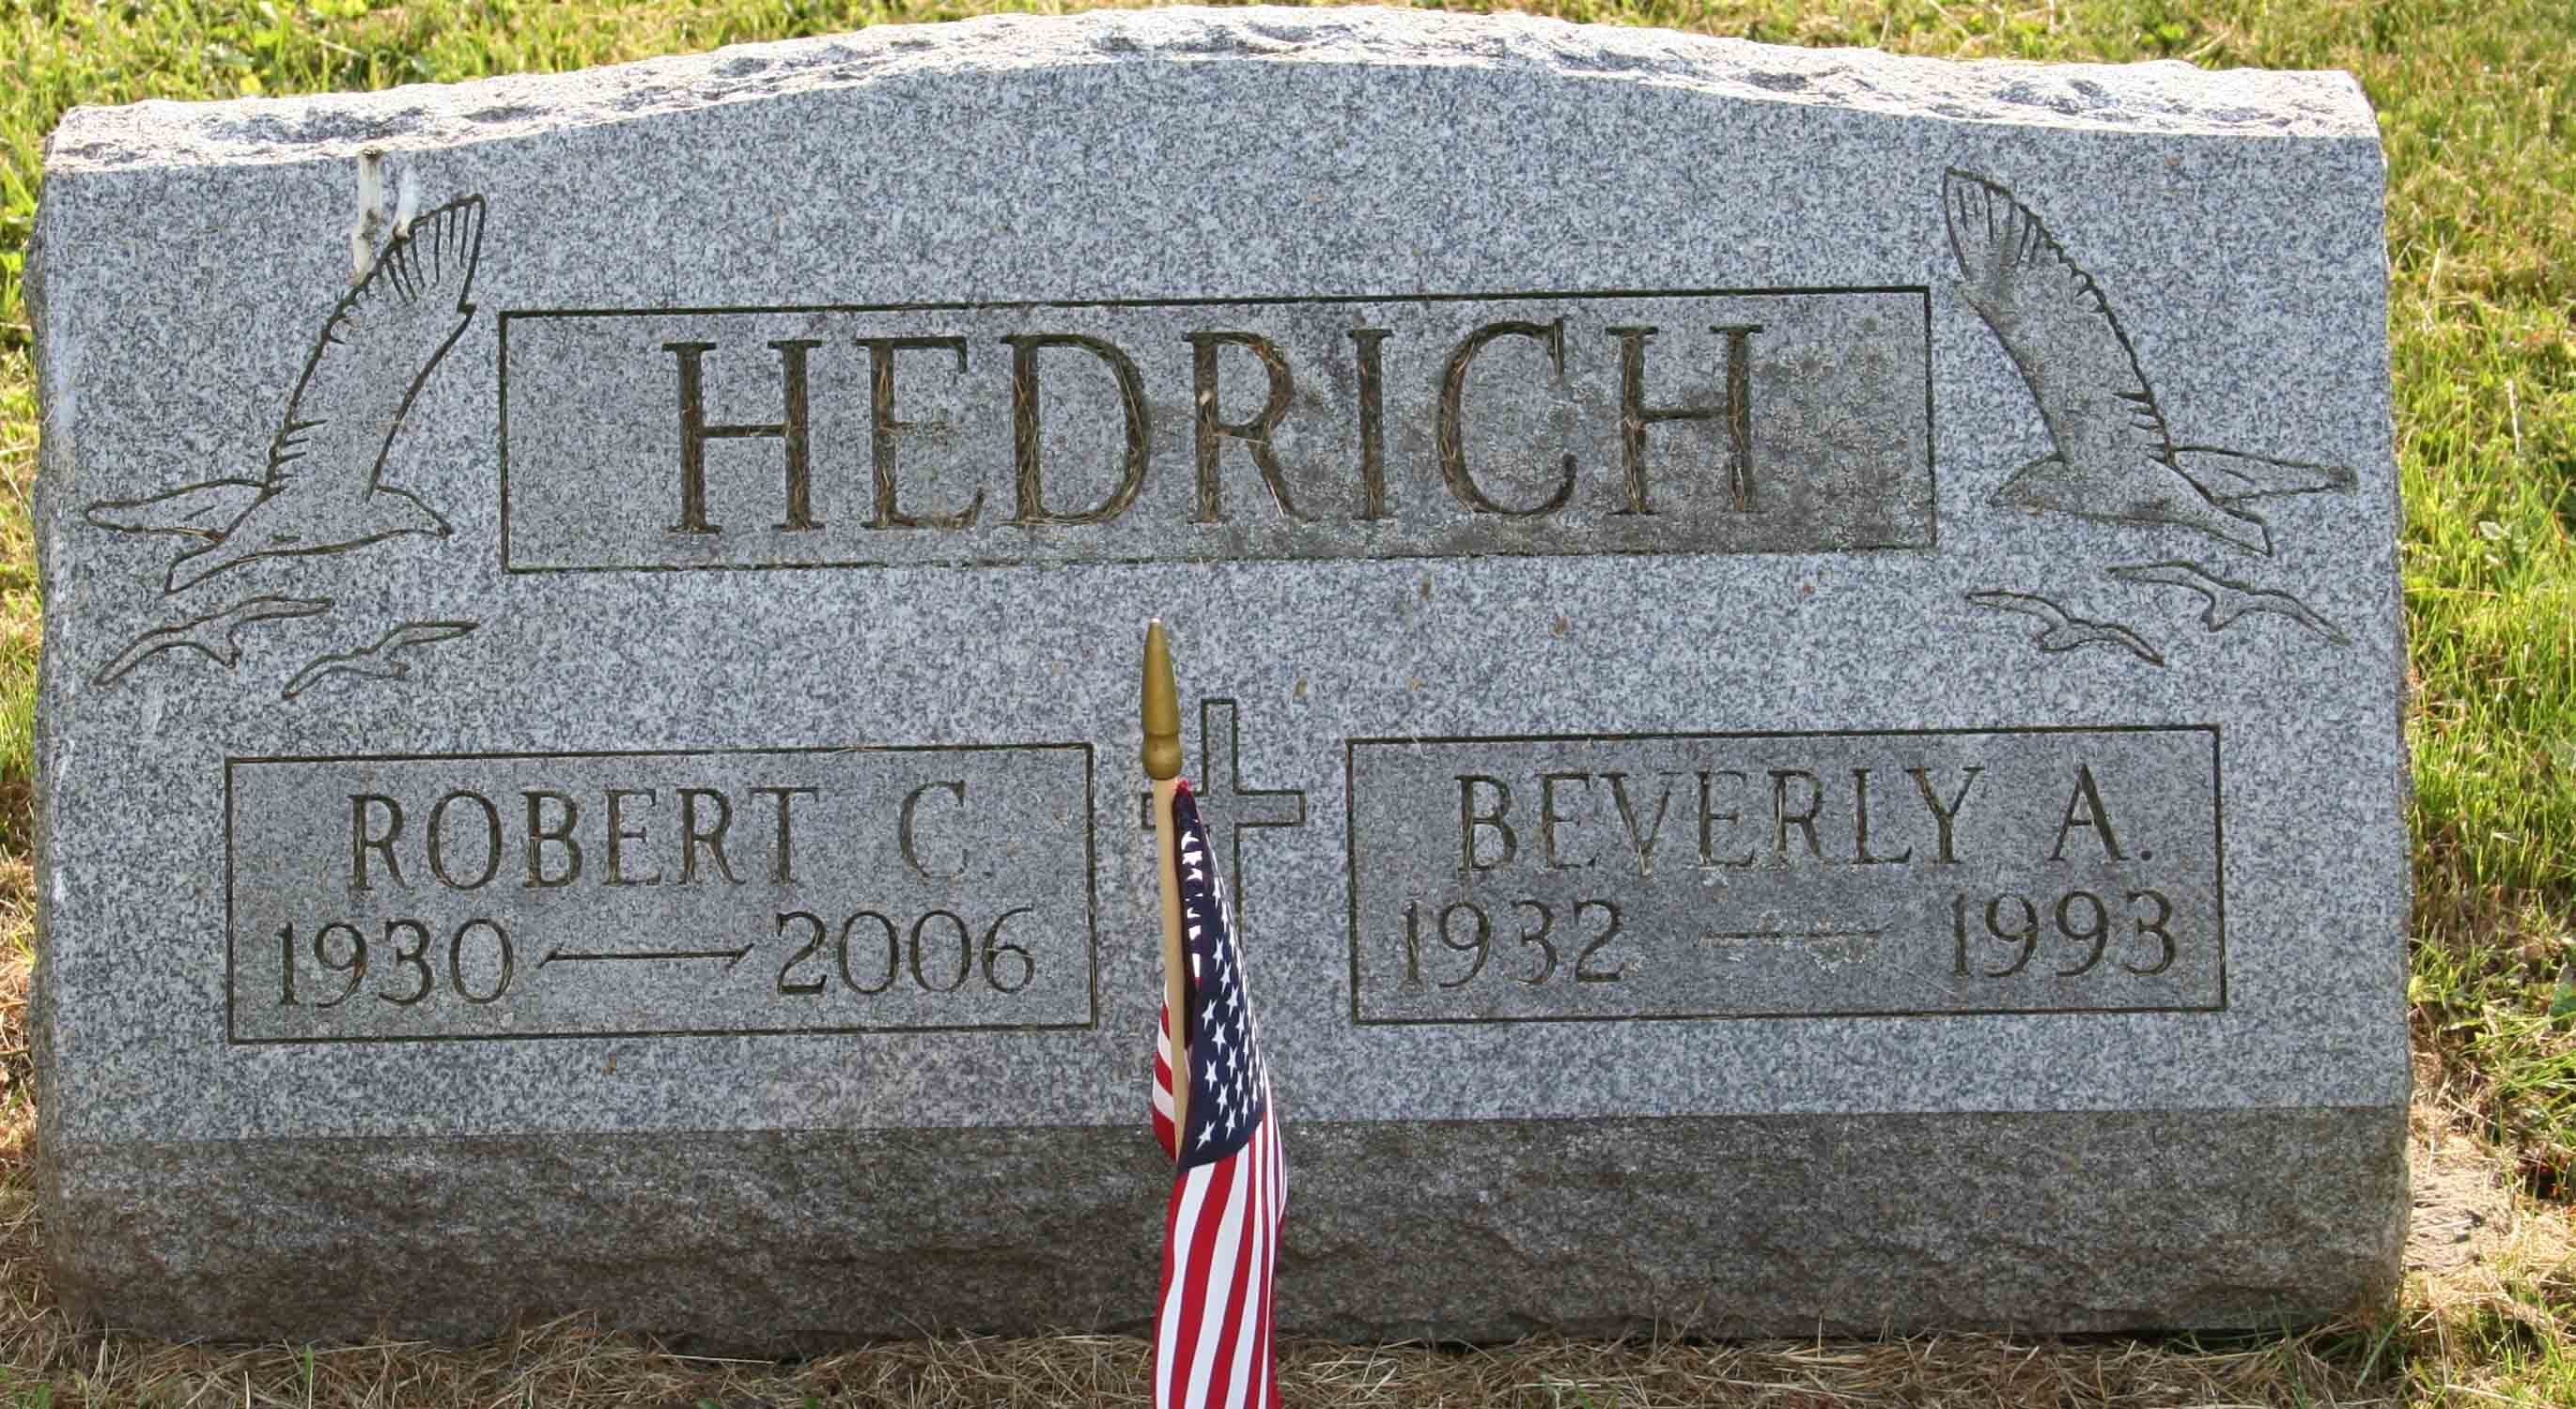 Beverly A <i>Pastor</i> Hedrich